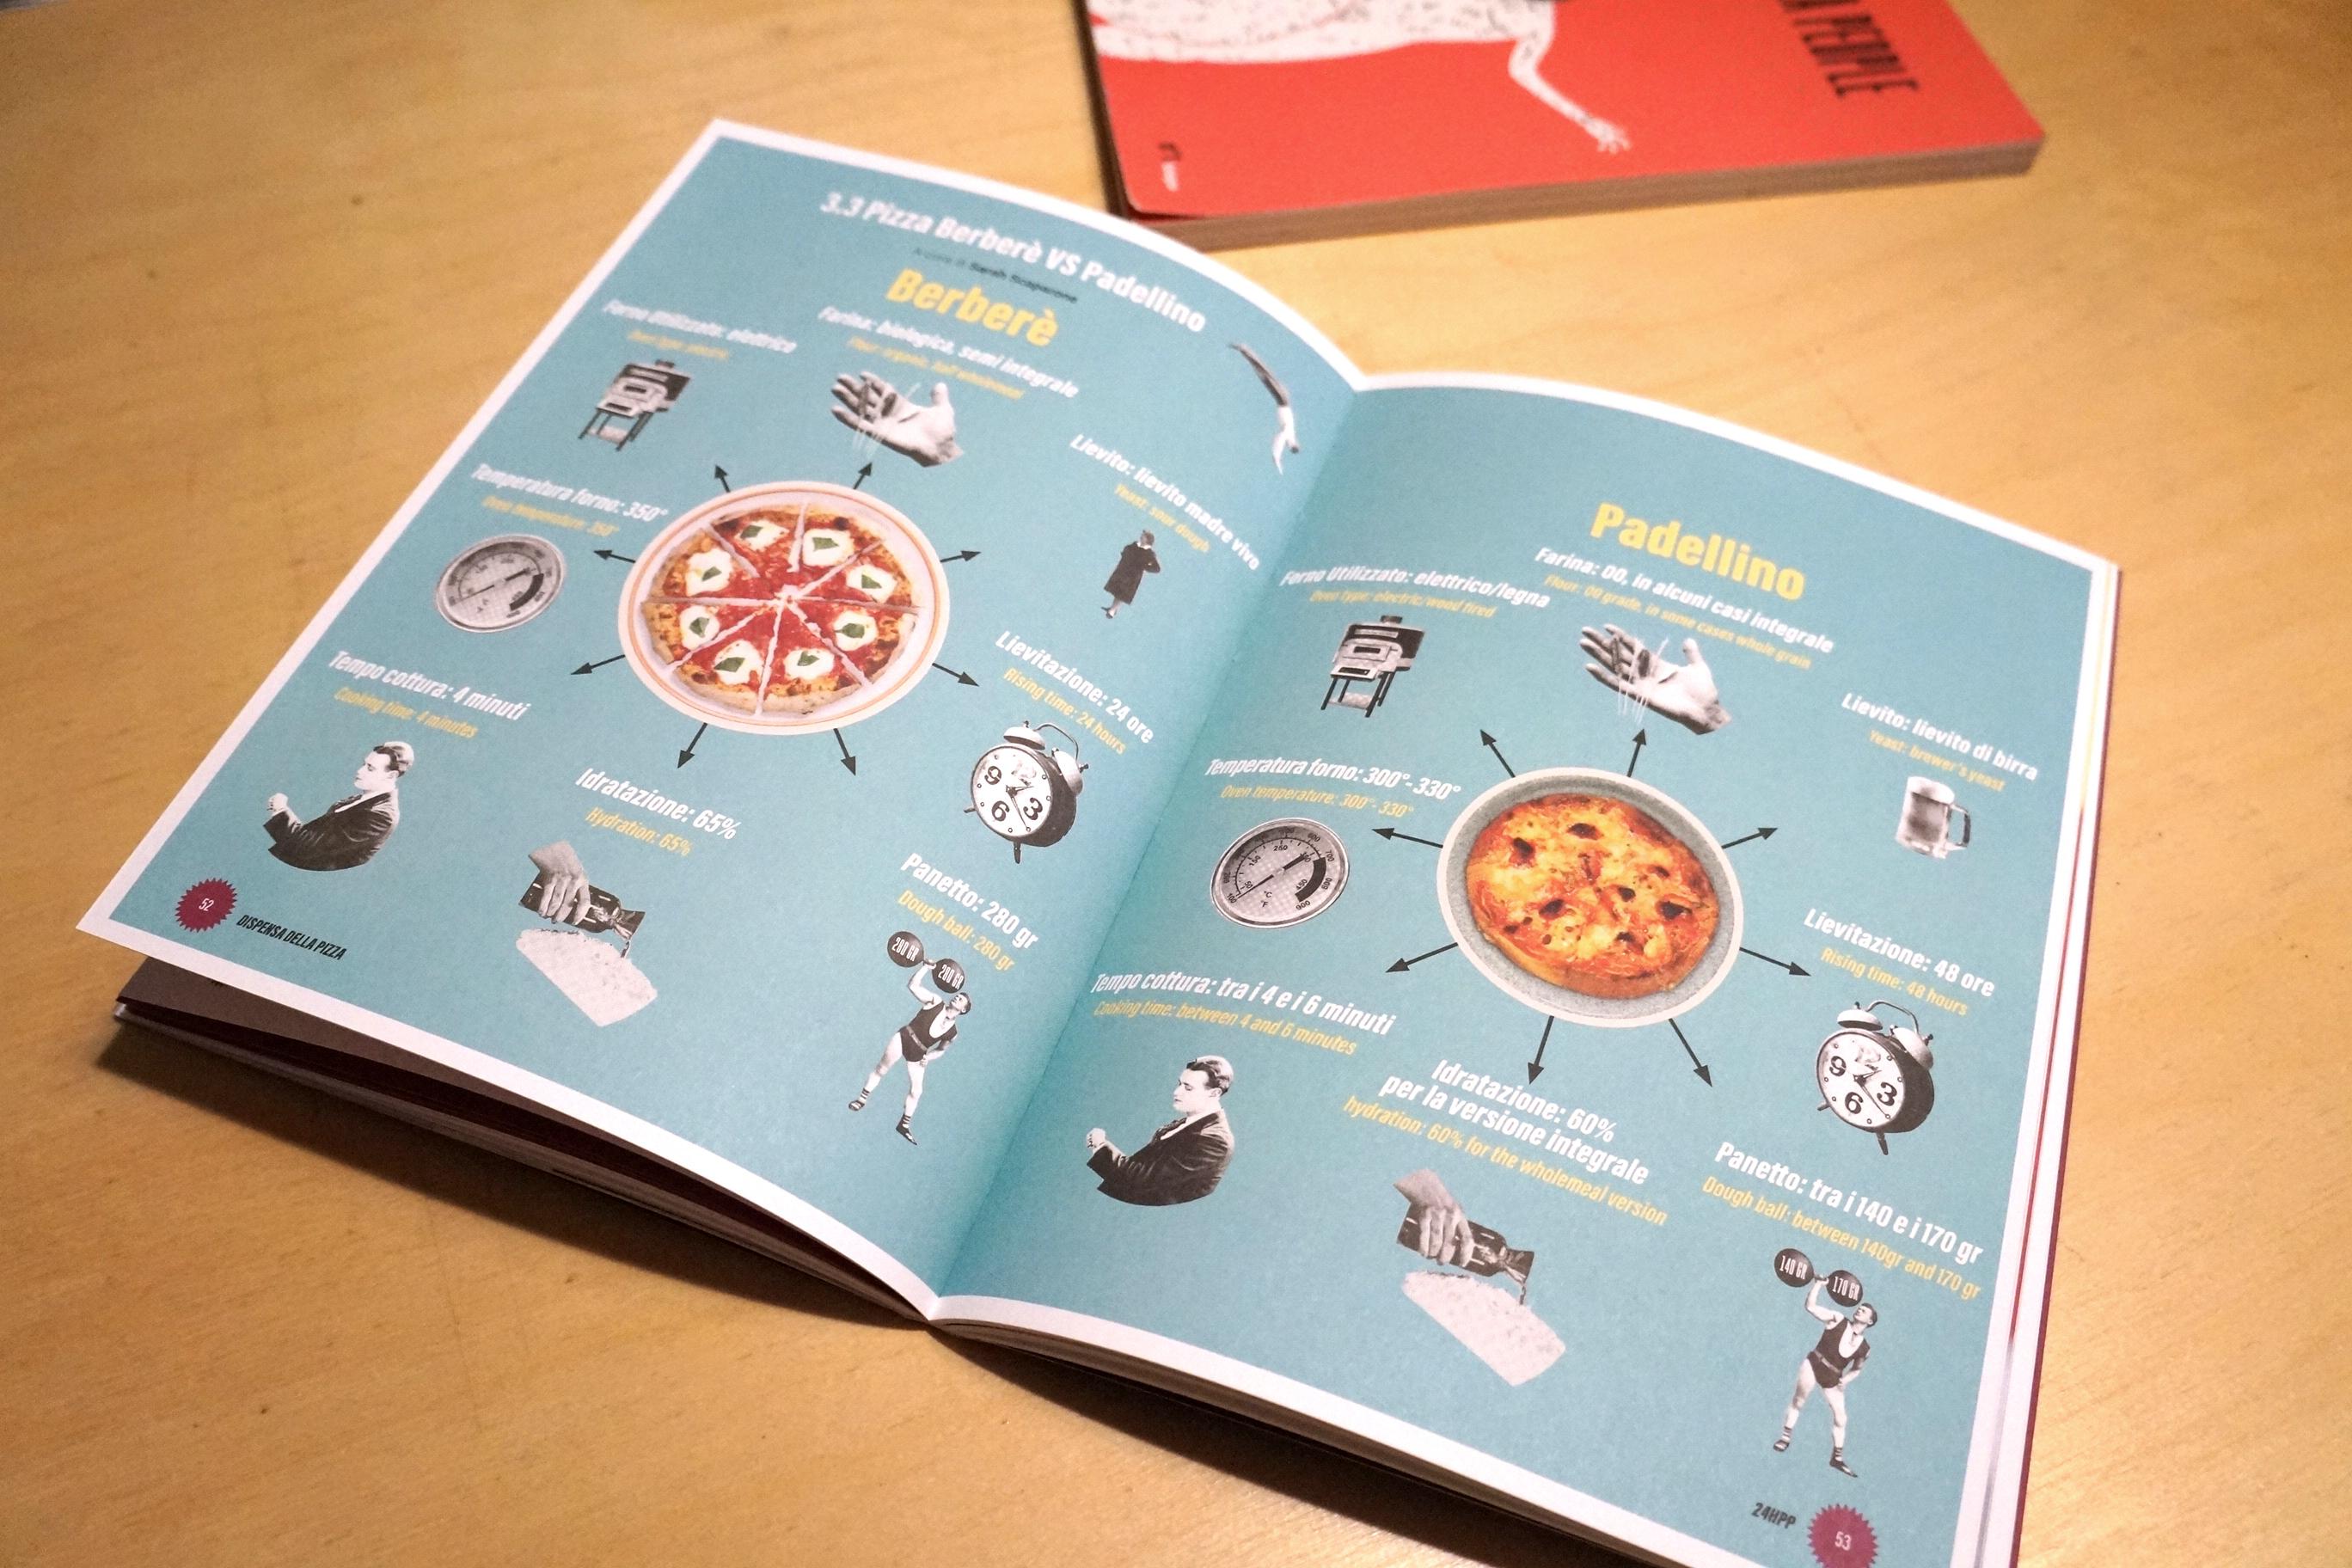 24 HOUR PIZZA PEOPLE  - MAGAZINE N°2  - TORINO